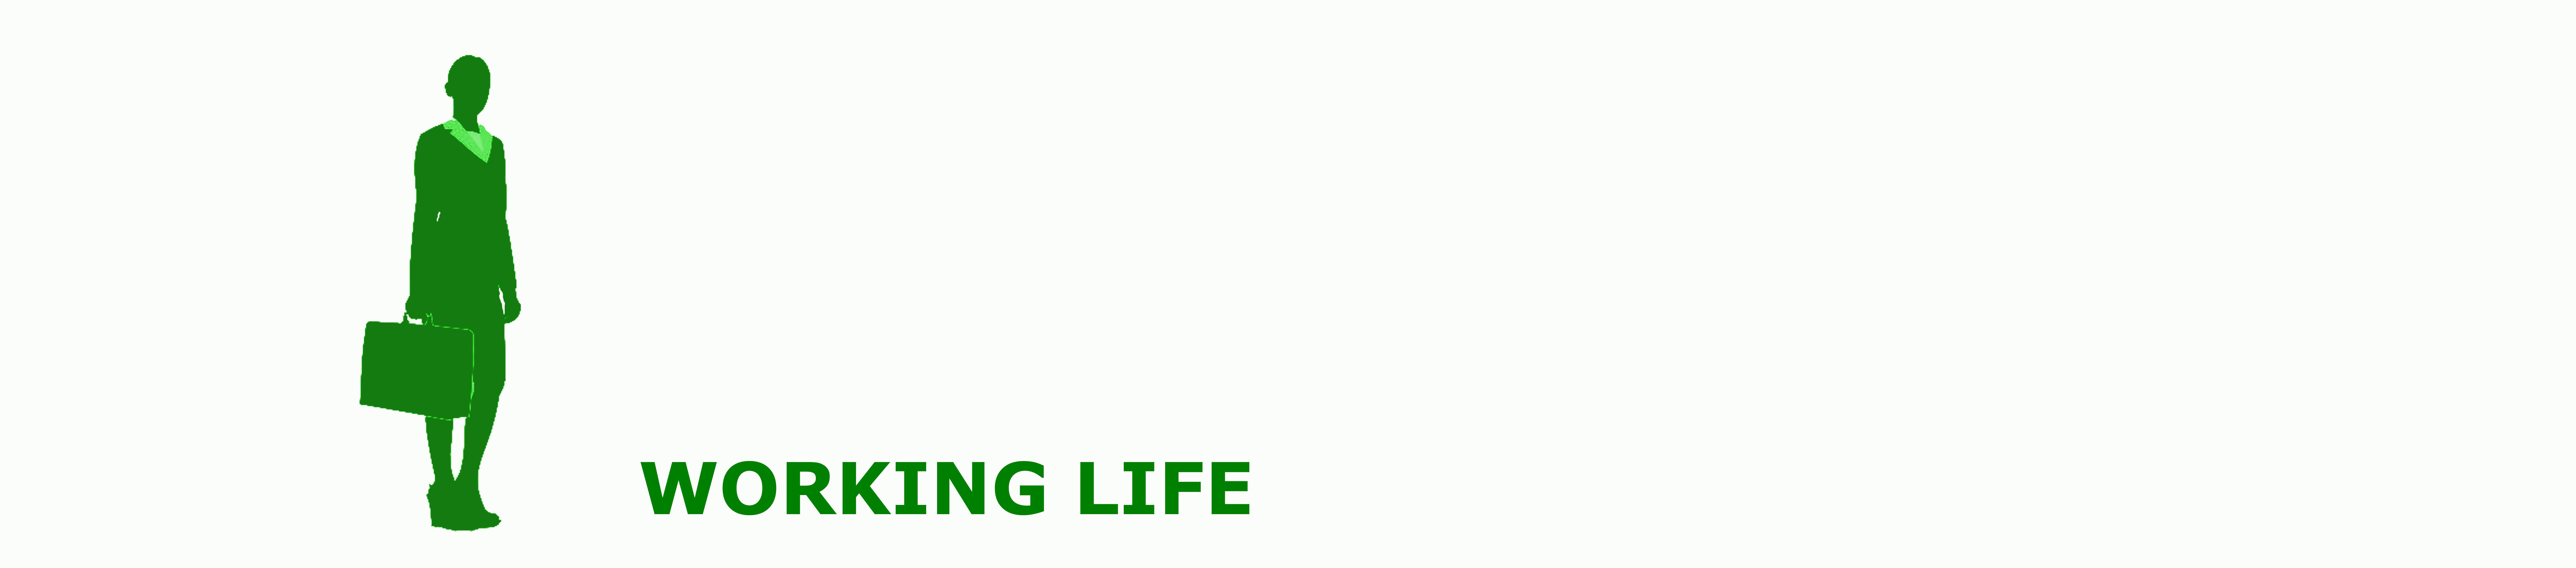 ayudar-estres-WORKING-LIFE-quiropracticlolivera